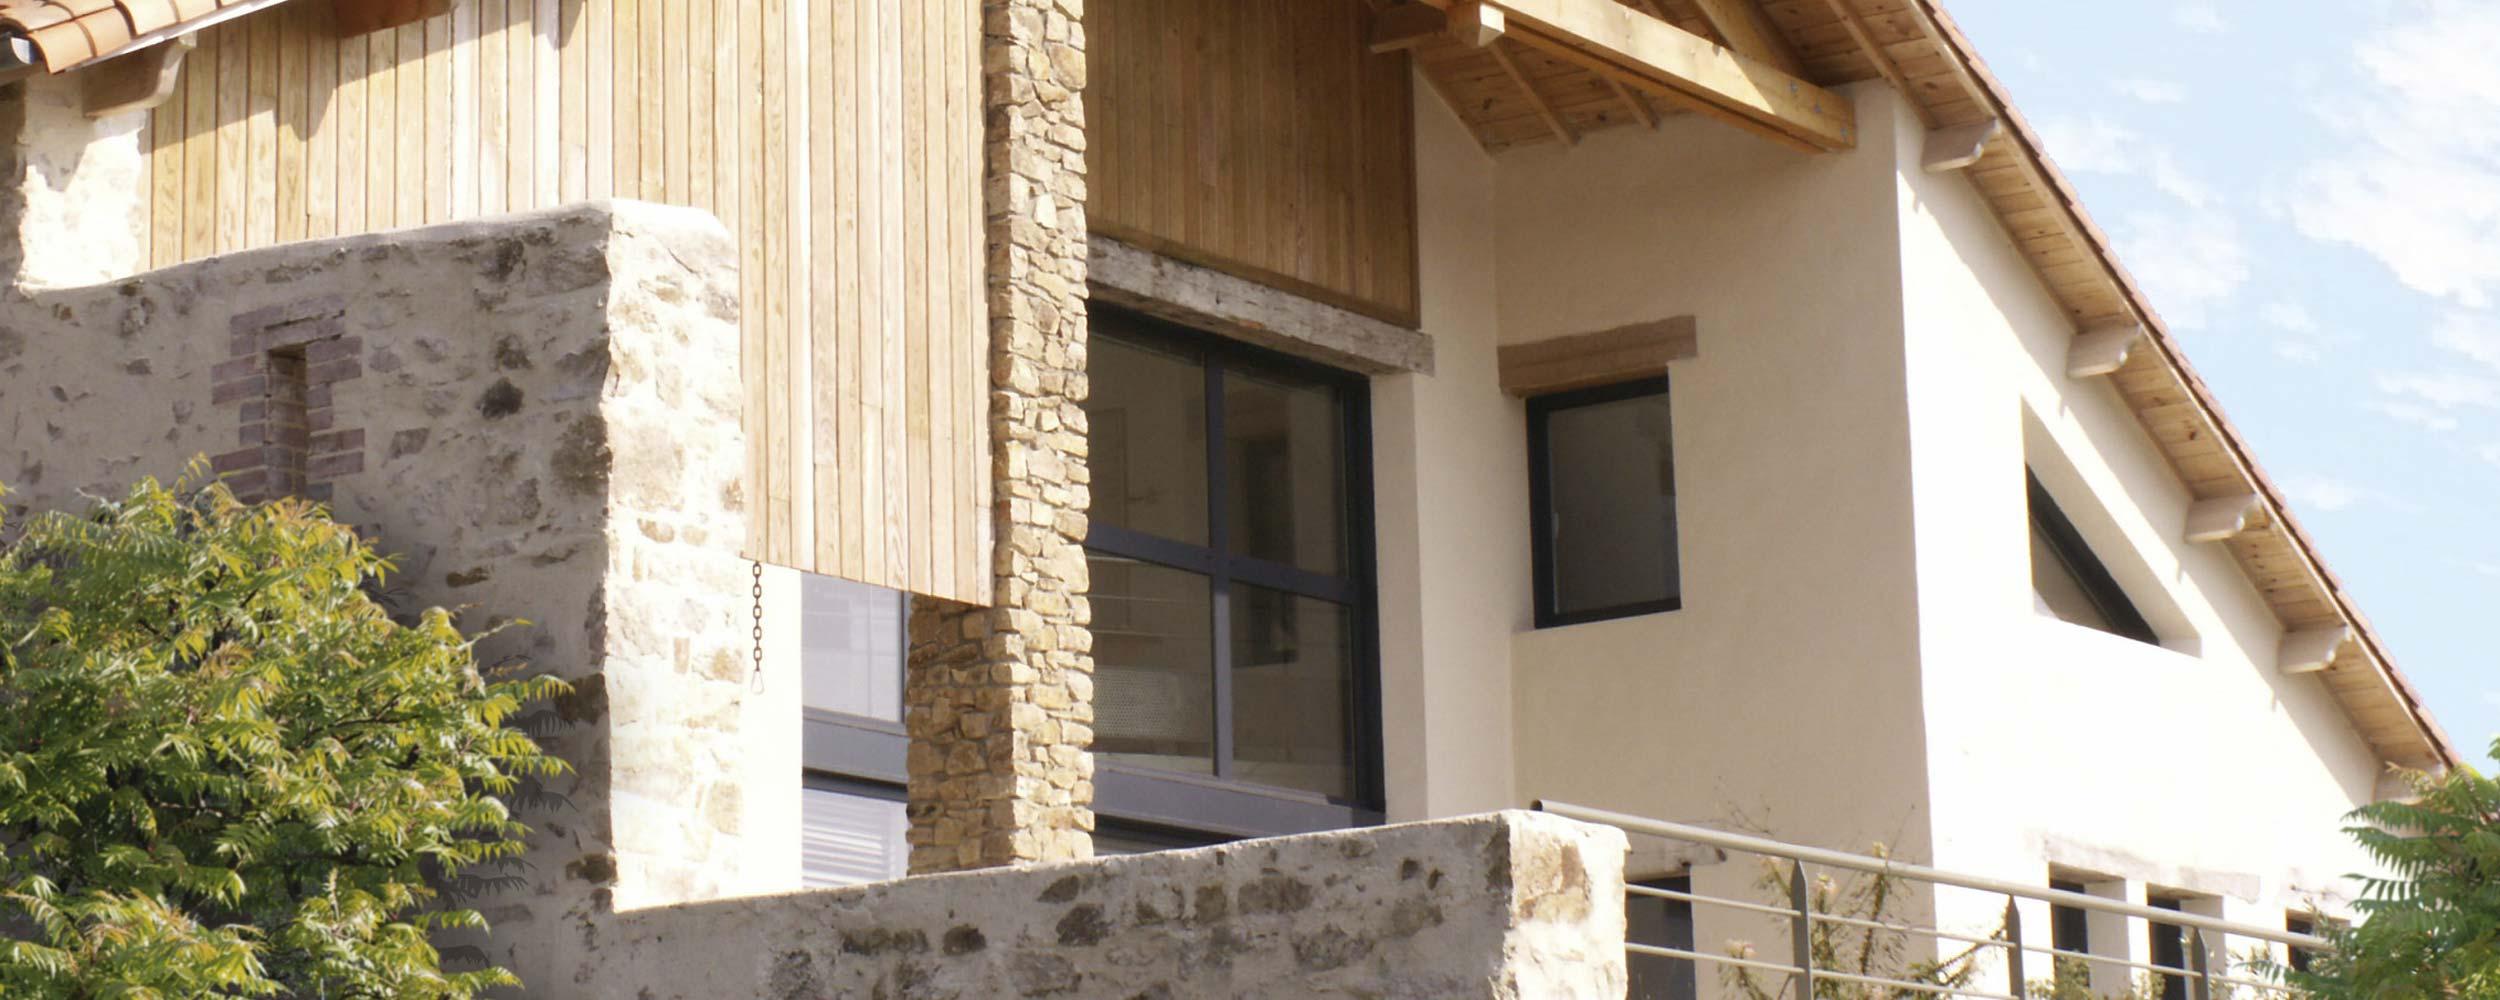 6 k jolie grange r novation 2 r novations extensions for Renovation grange